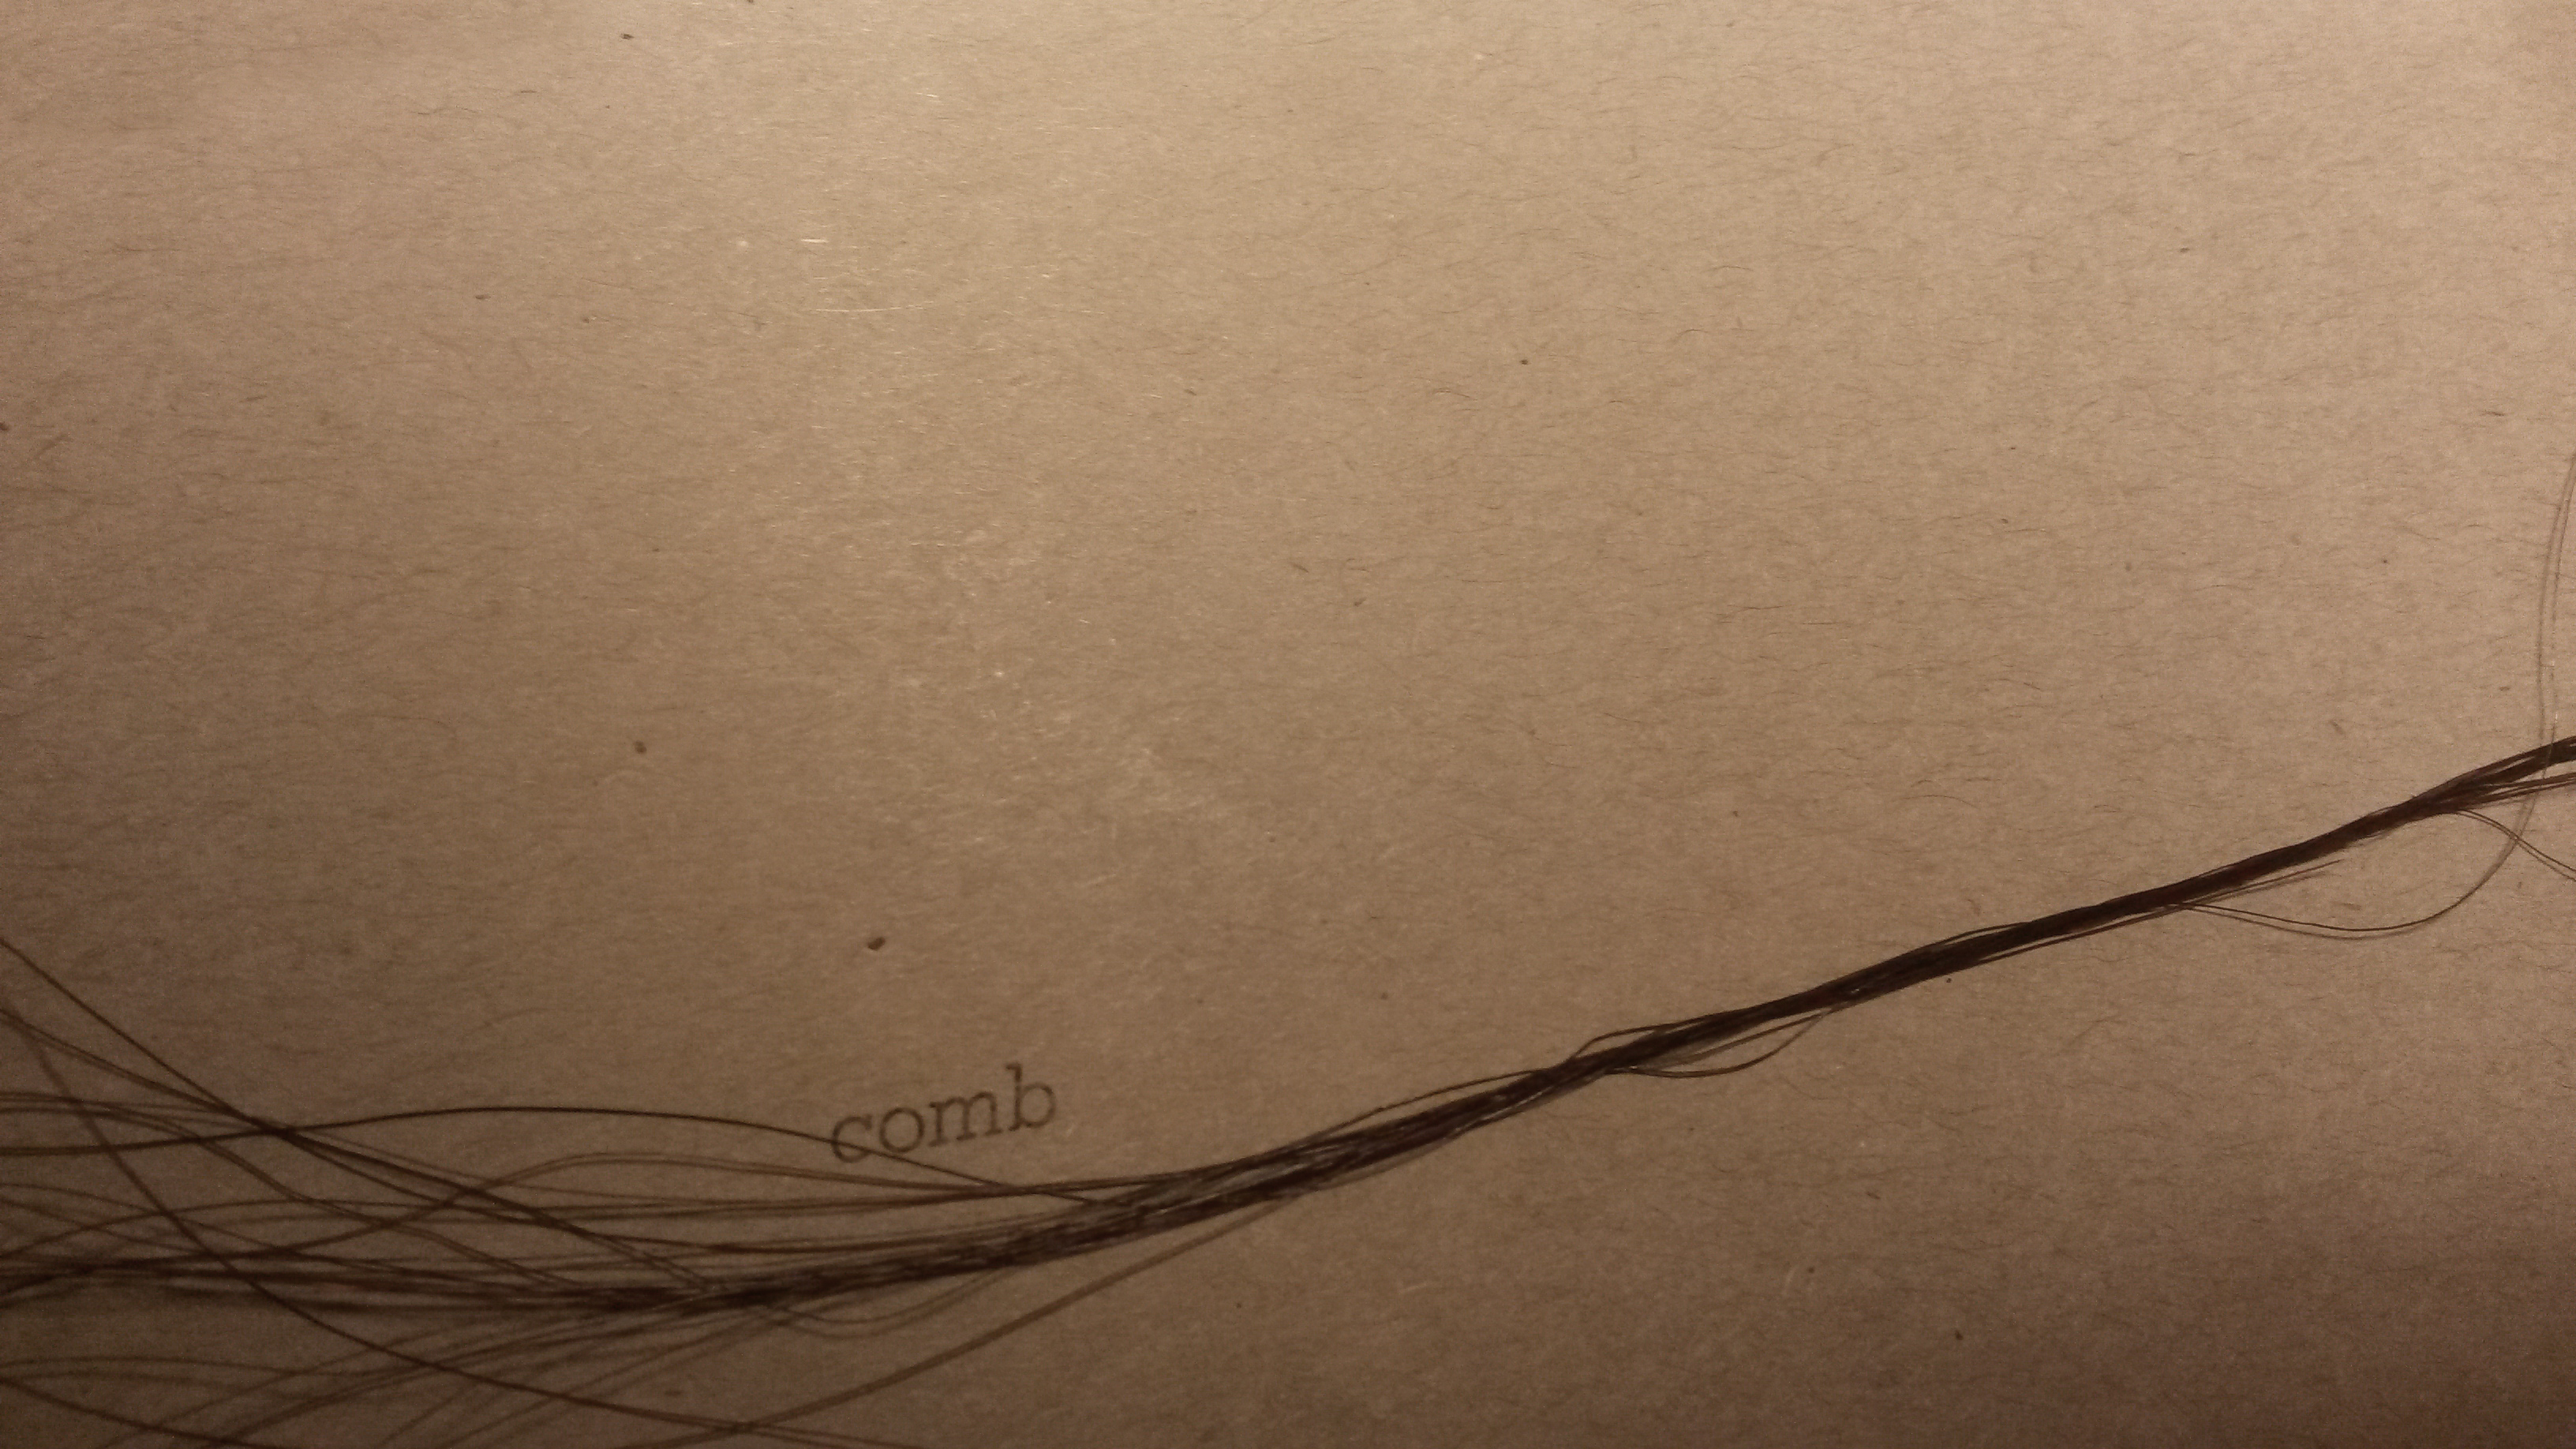 Human Hair Split Ends Under Microscope 72307 | VIZUALIZE